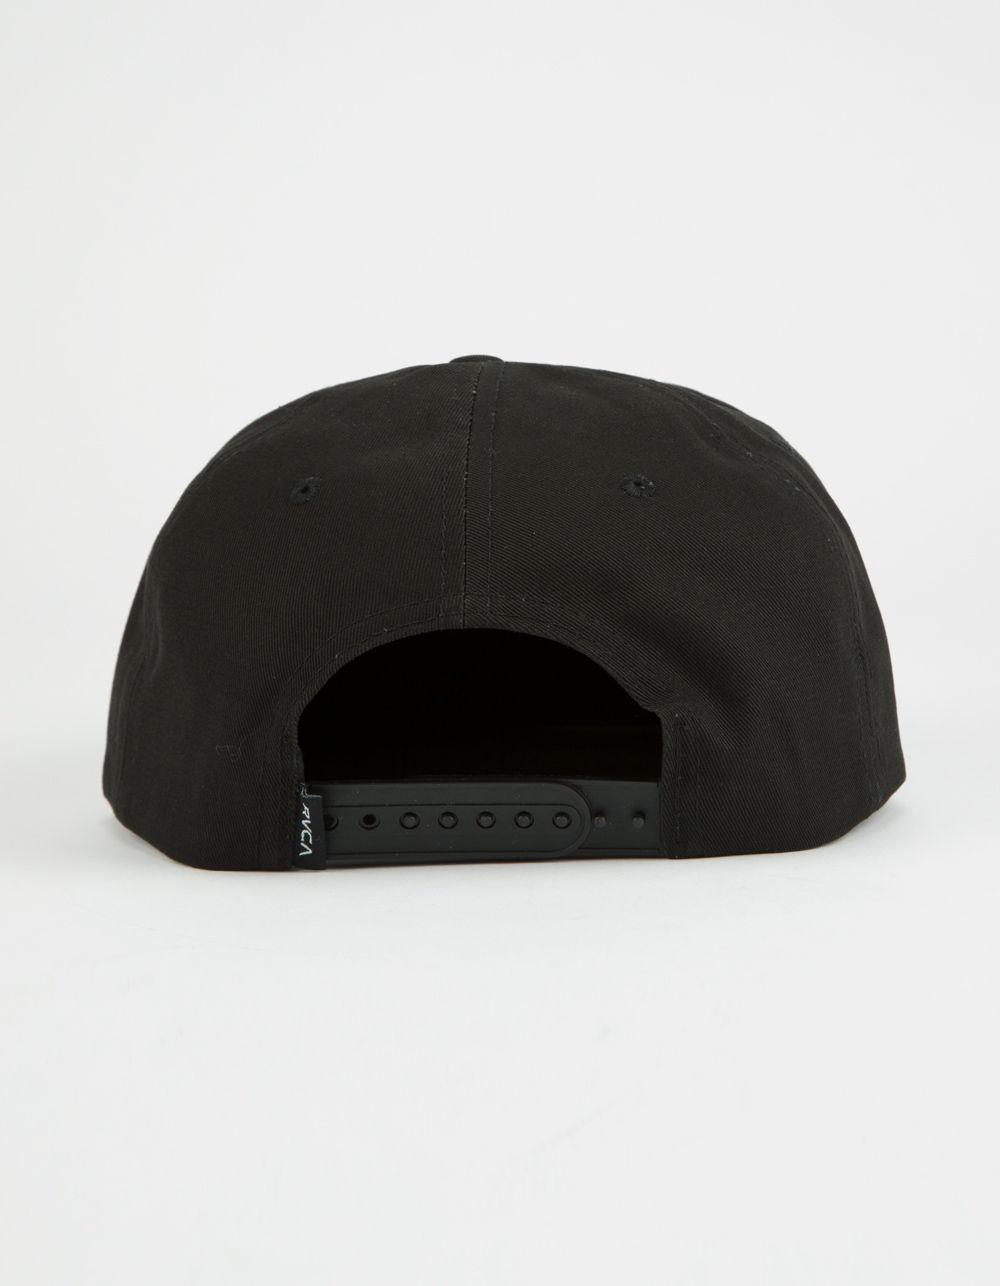 45c4645587faf ... reduced lyst rvca parrots unstructured mens snapback hat in black for  men 3a326 80d04